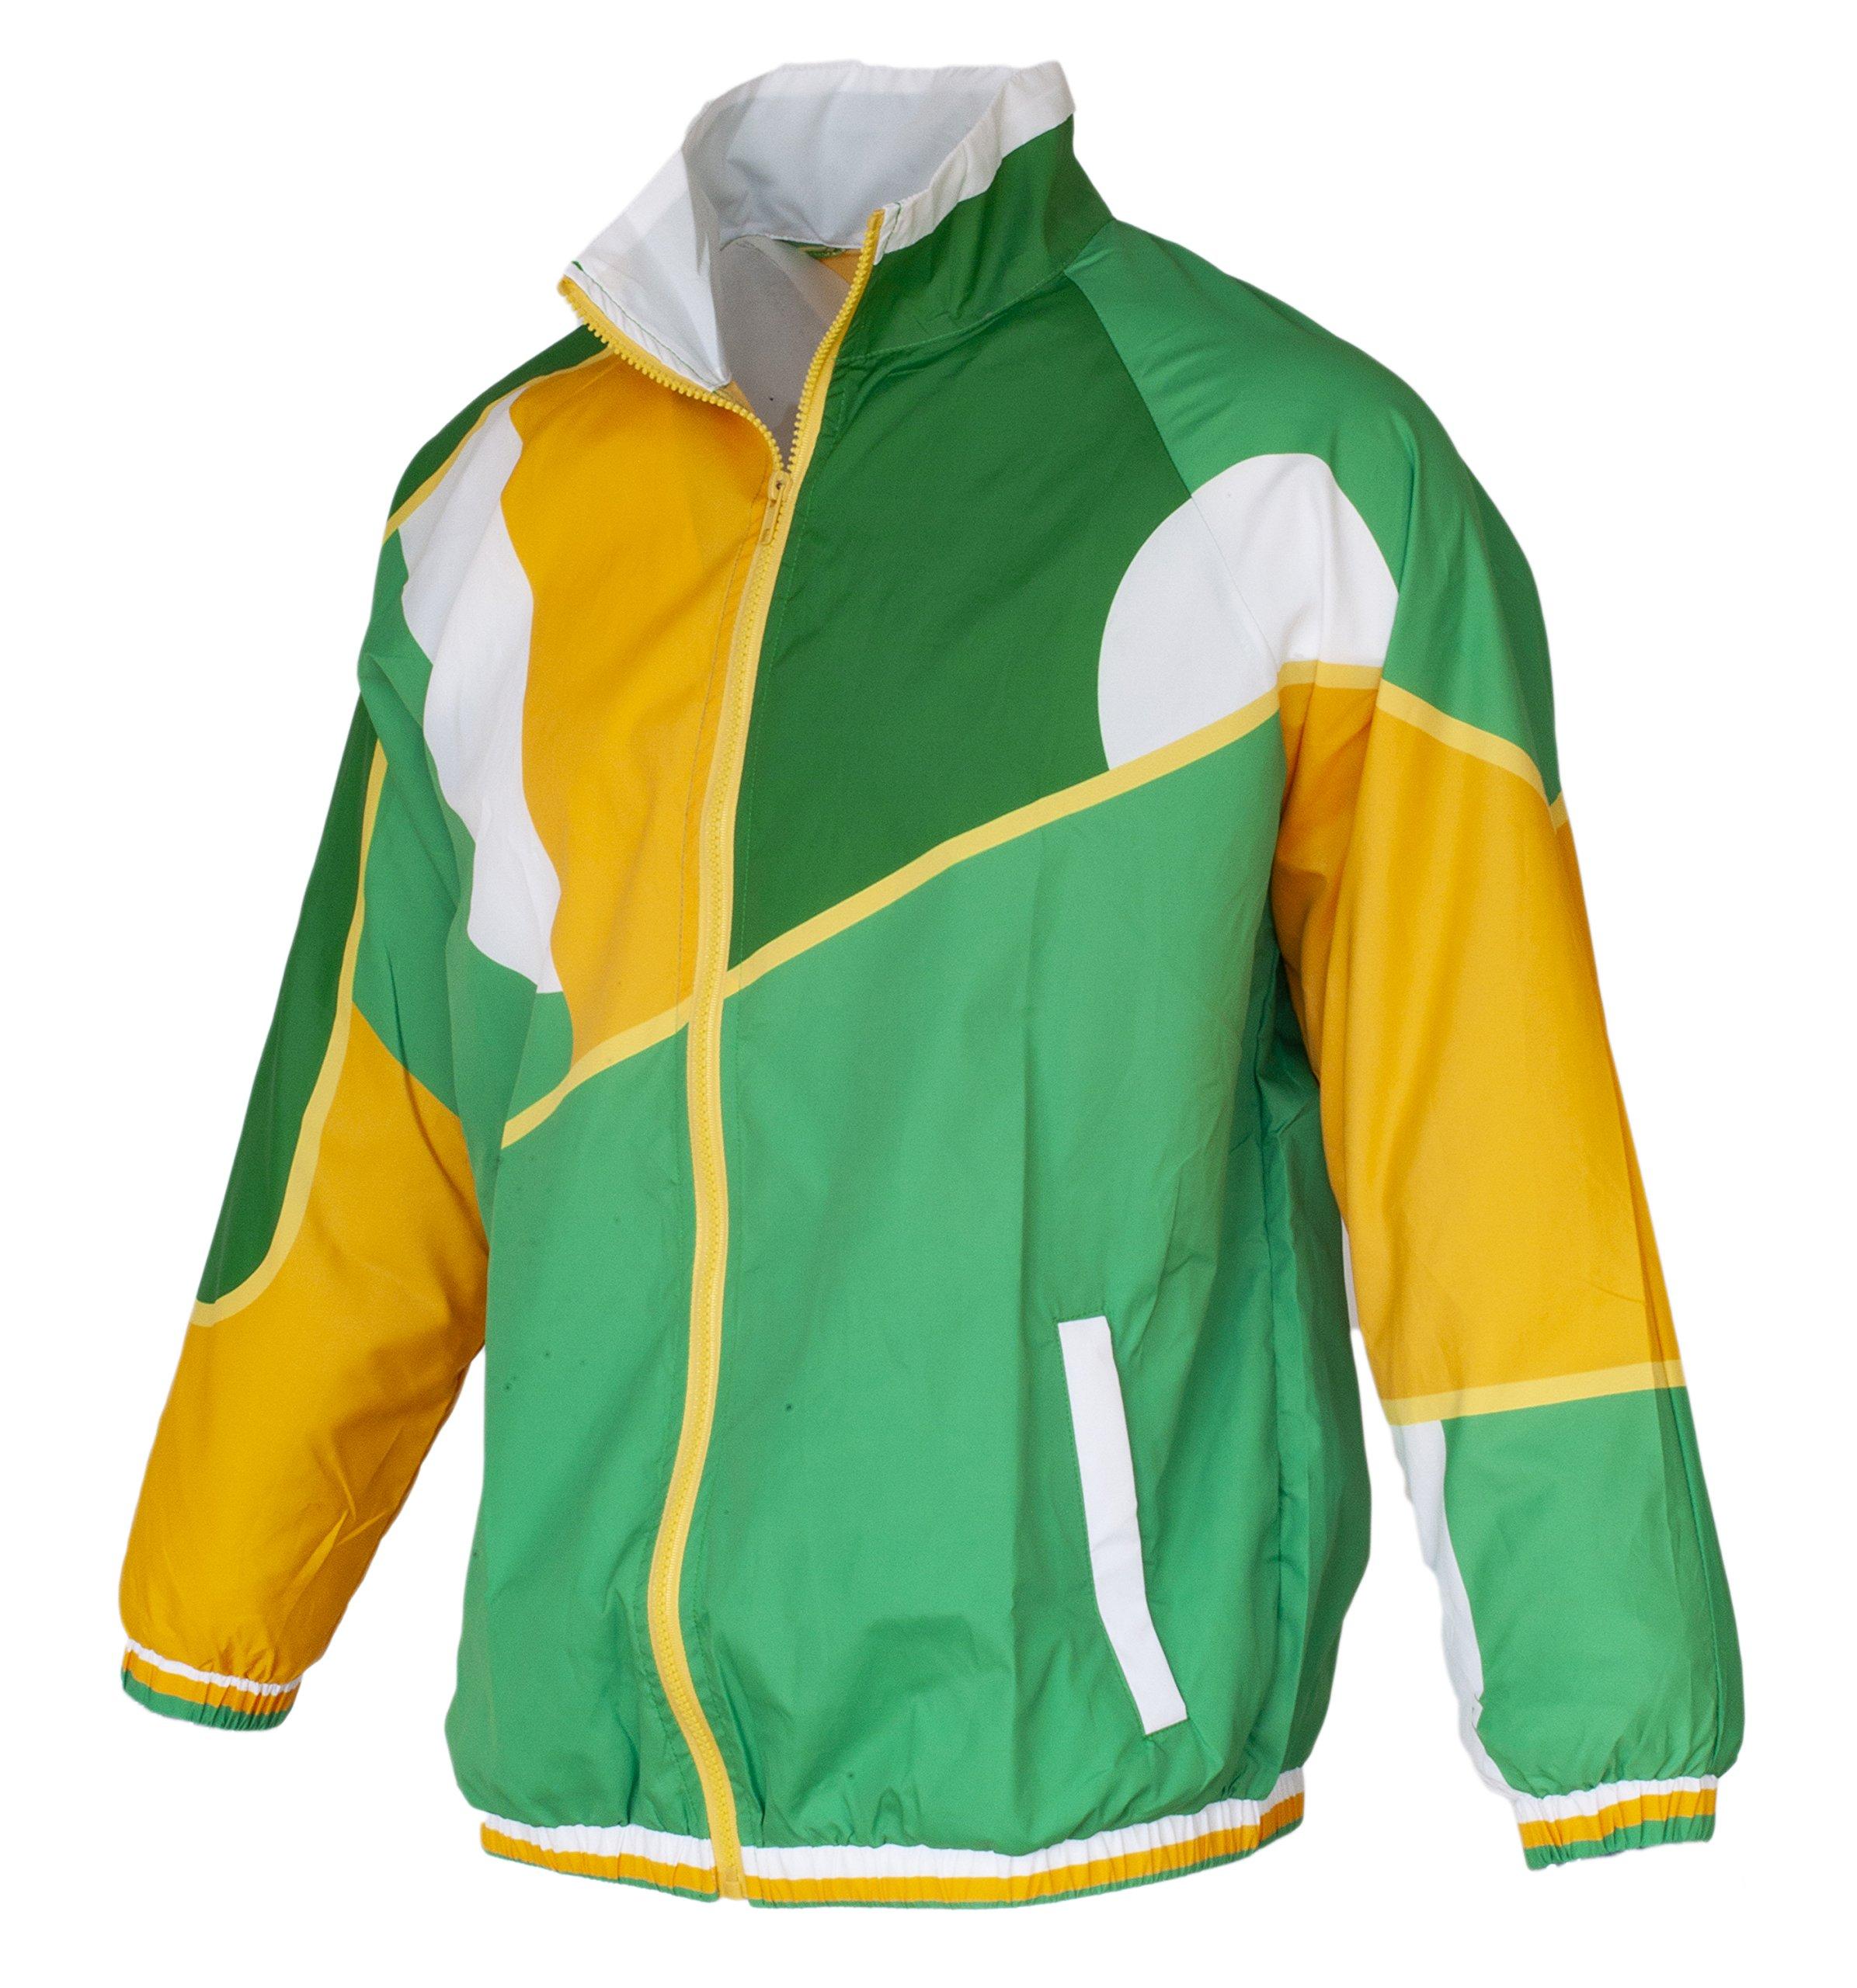 Funny Guy Mugs Irish 80s & 90s Retro Neon Windbreaker, Large - St Patrick's Day Jacket by Funny Guy Mugs